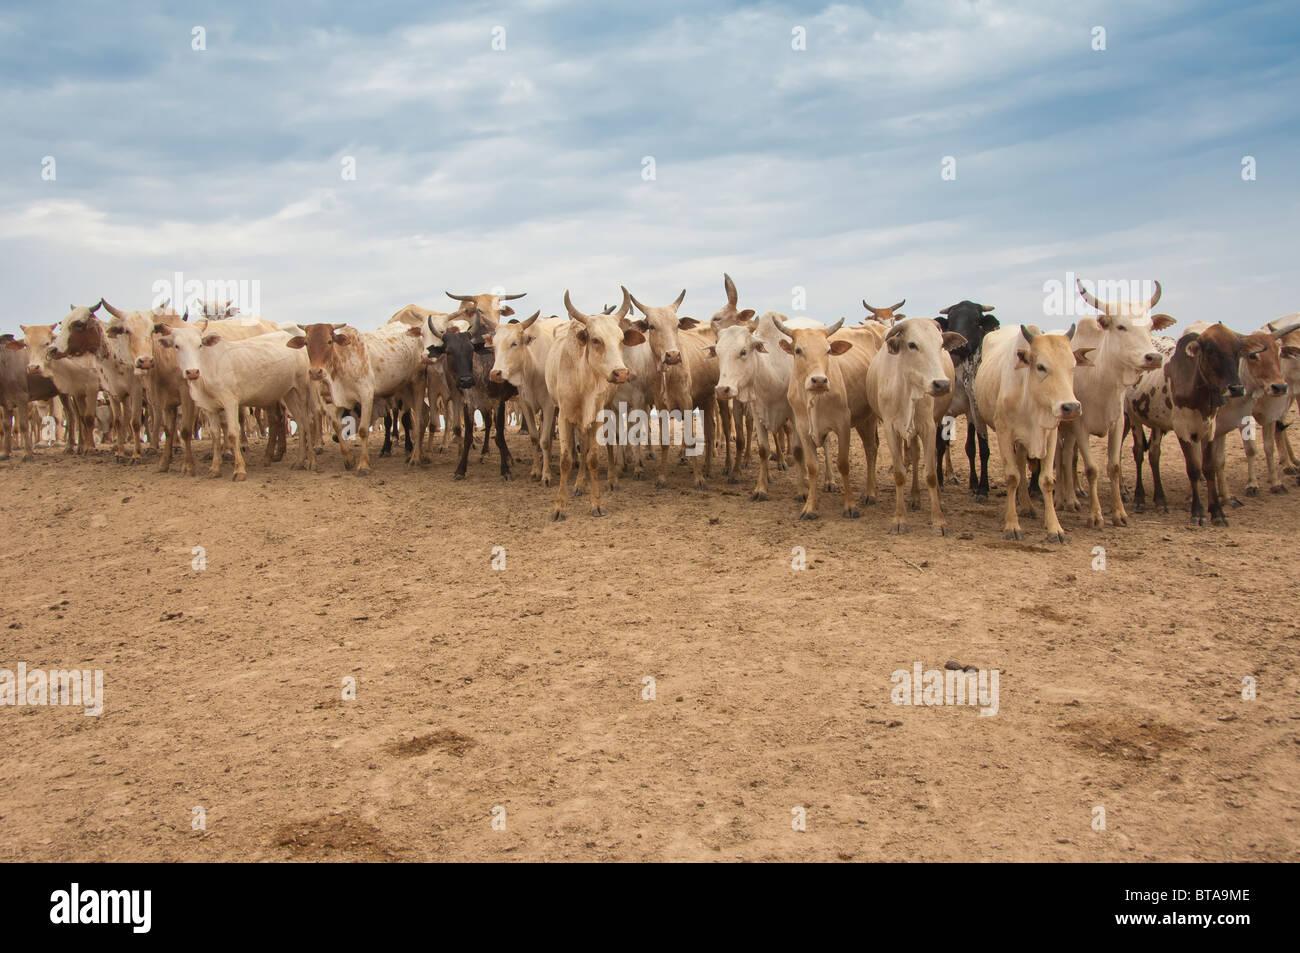 Cow herd, Nyangatom (Bumi) tribe, Omo River Valley, Ethiopia Stock Photo